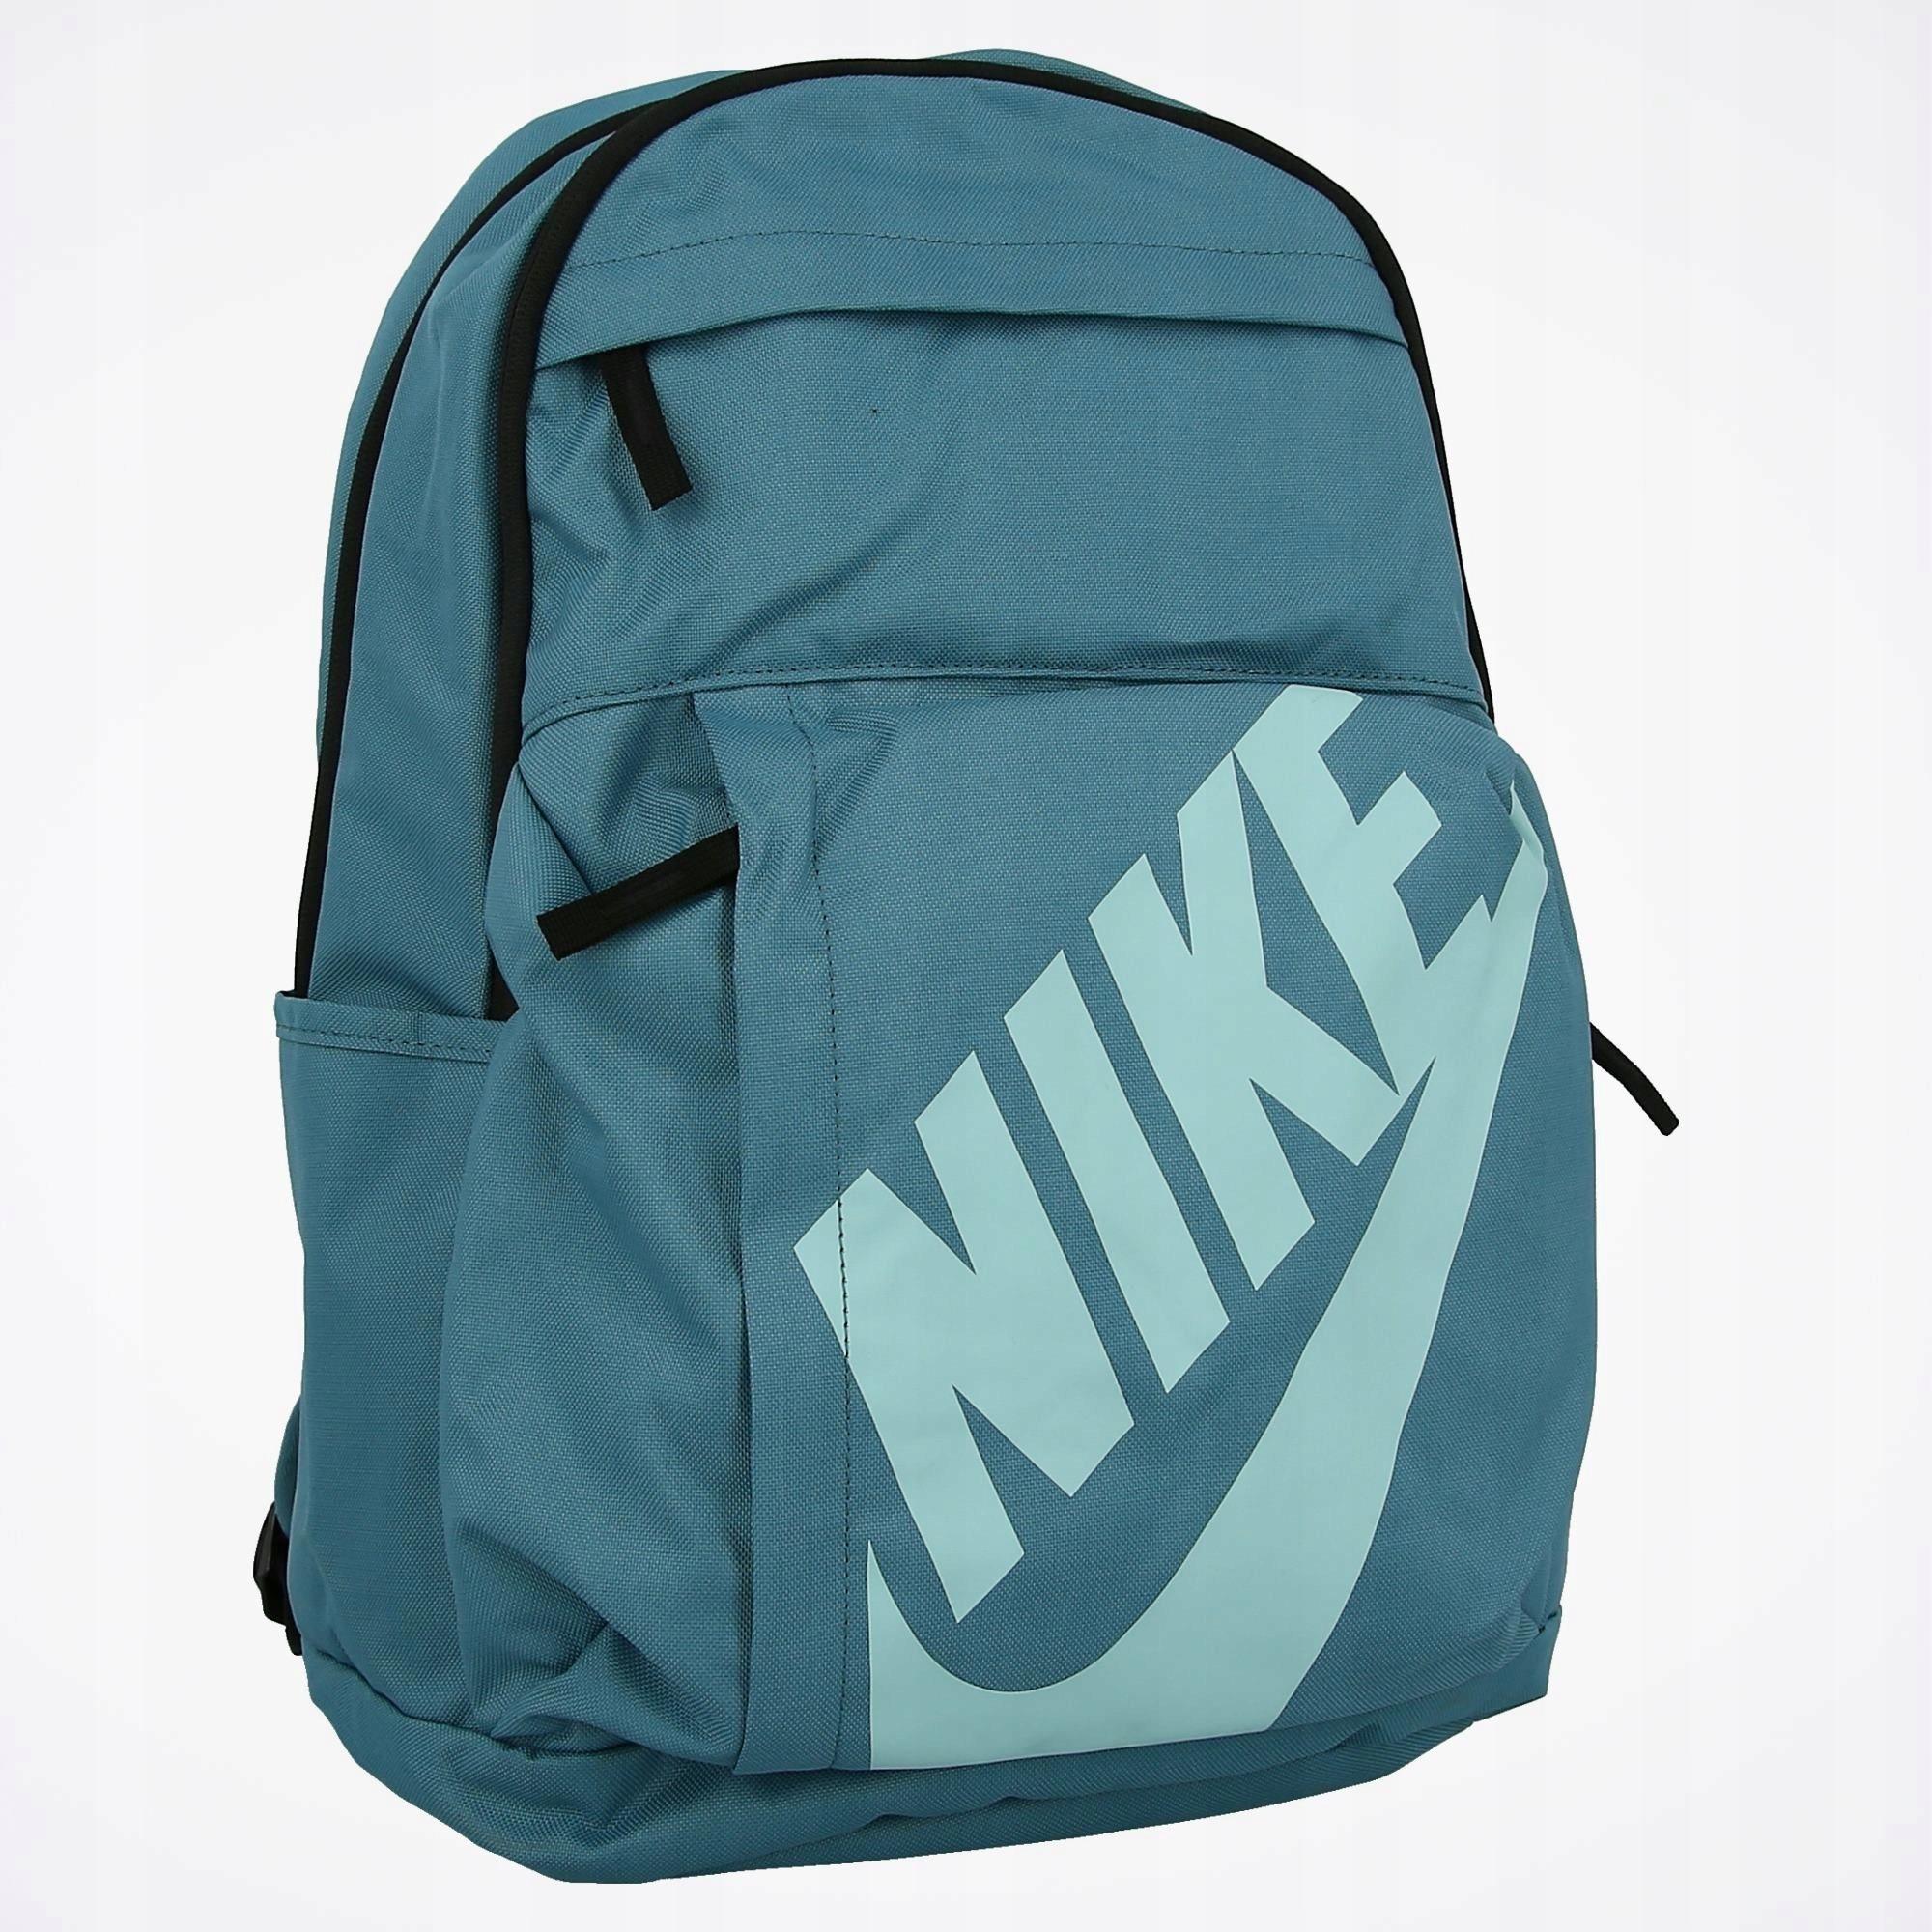 Plecak szkolny, miejski Nike Elemental BA5381-454 - 7521886786 ... 915e966e6b